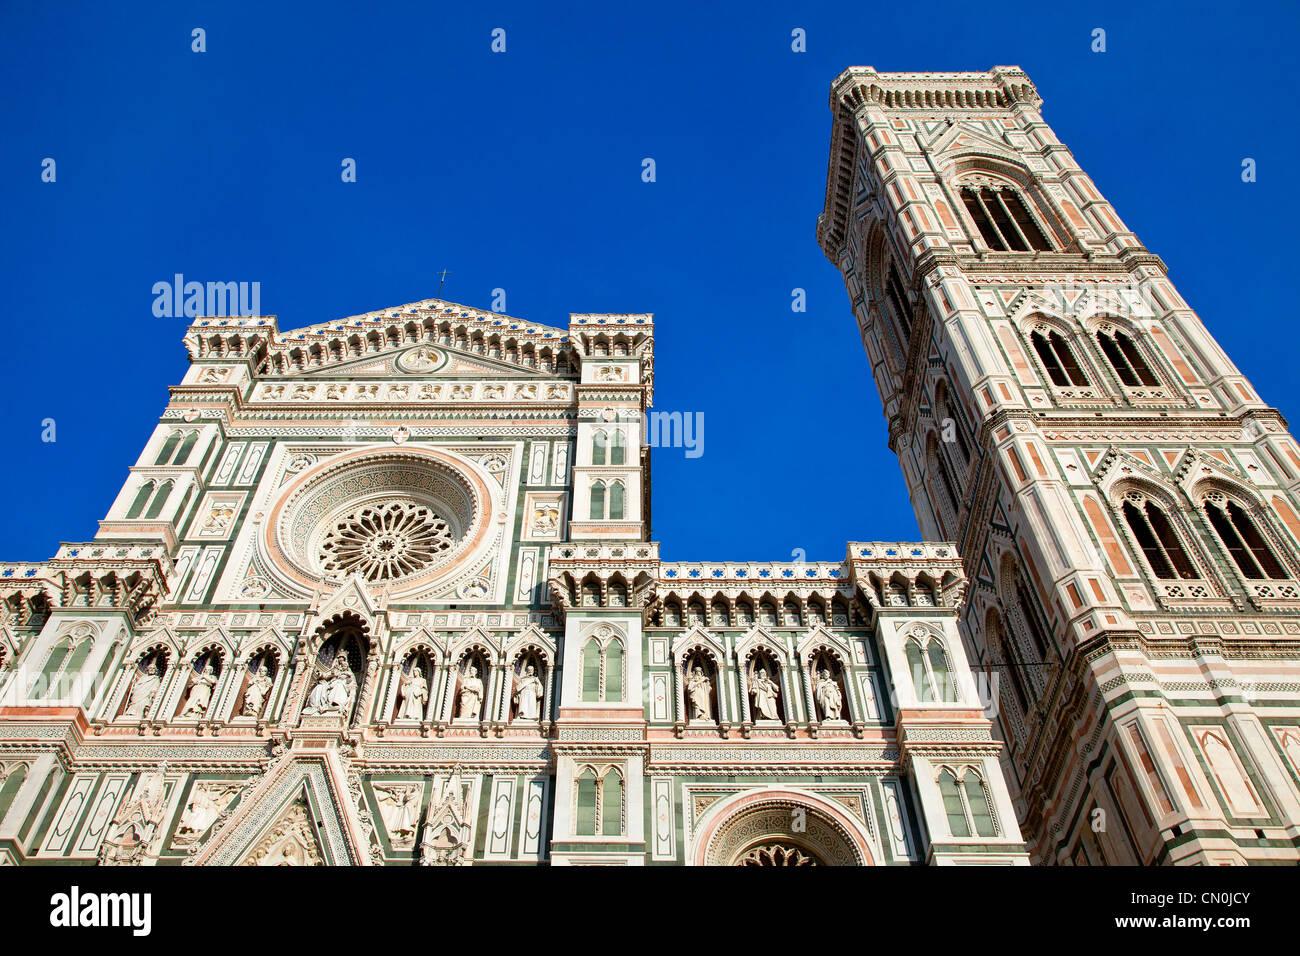 Florence, Duomo Santa Maria del Fiore Cathedral - Stock Image